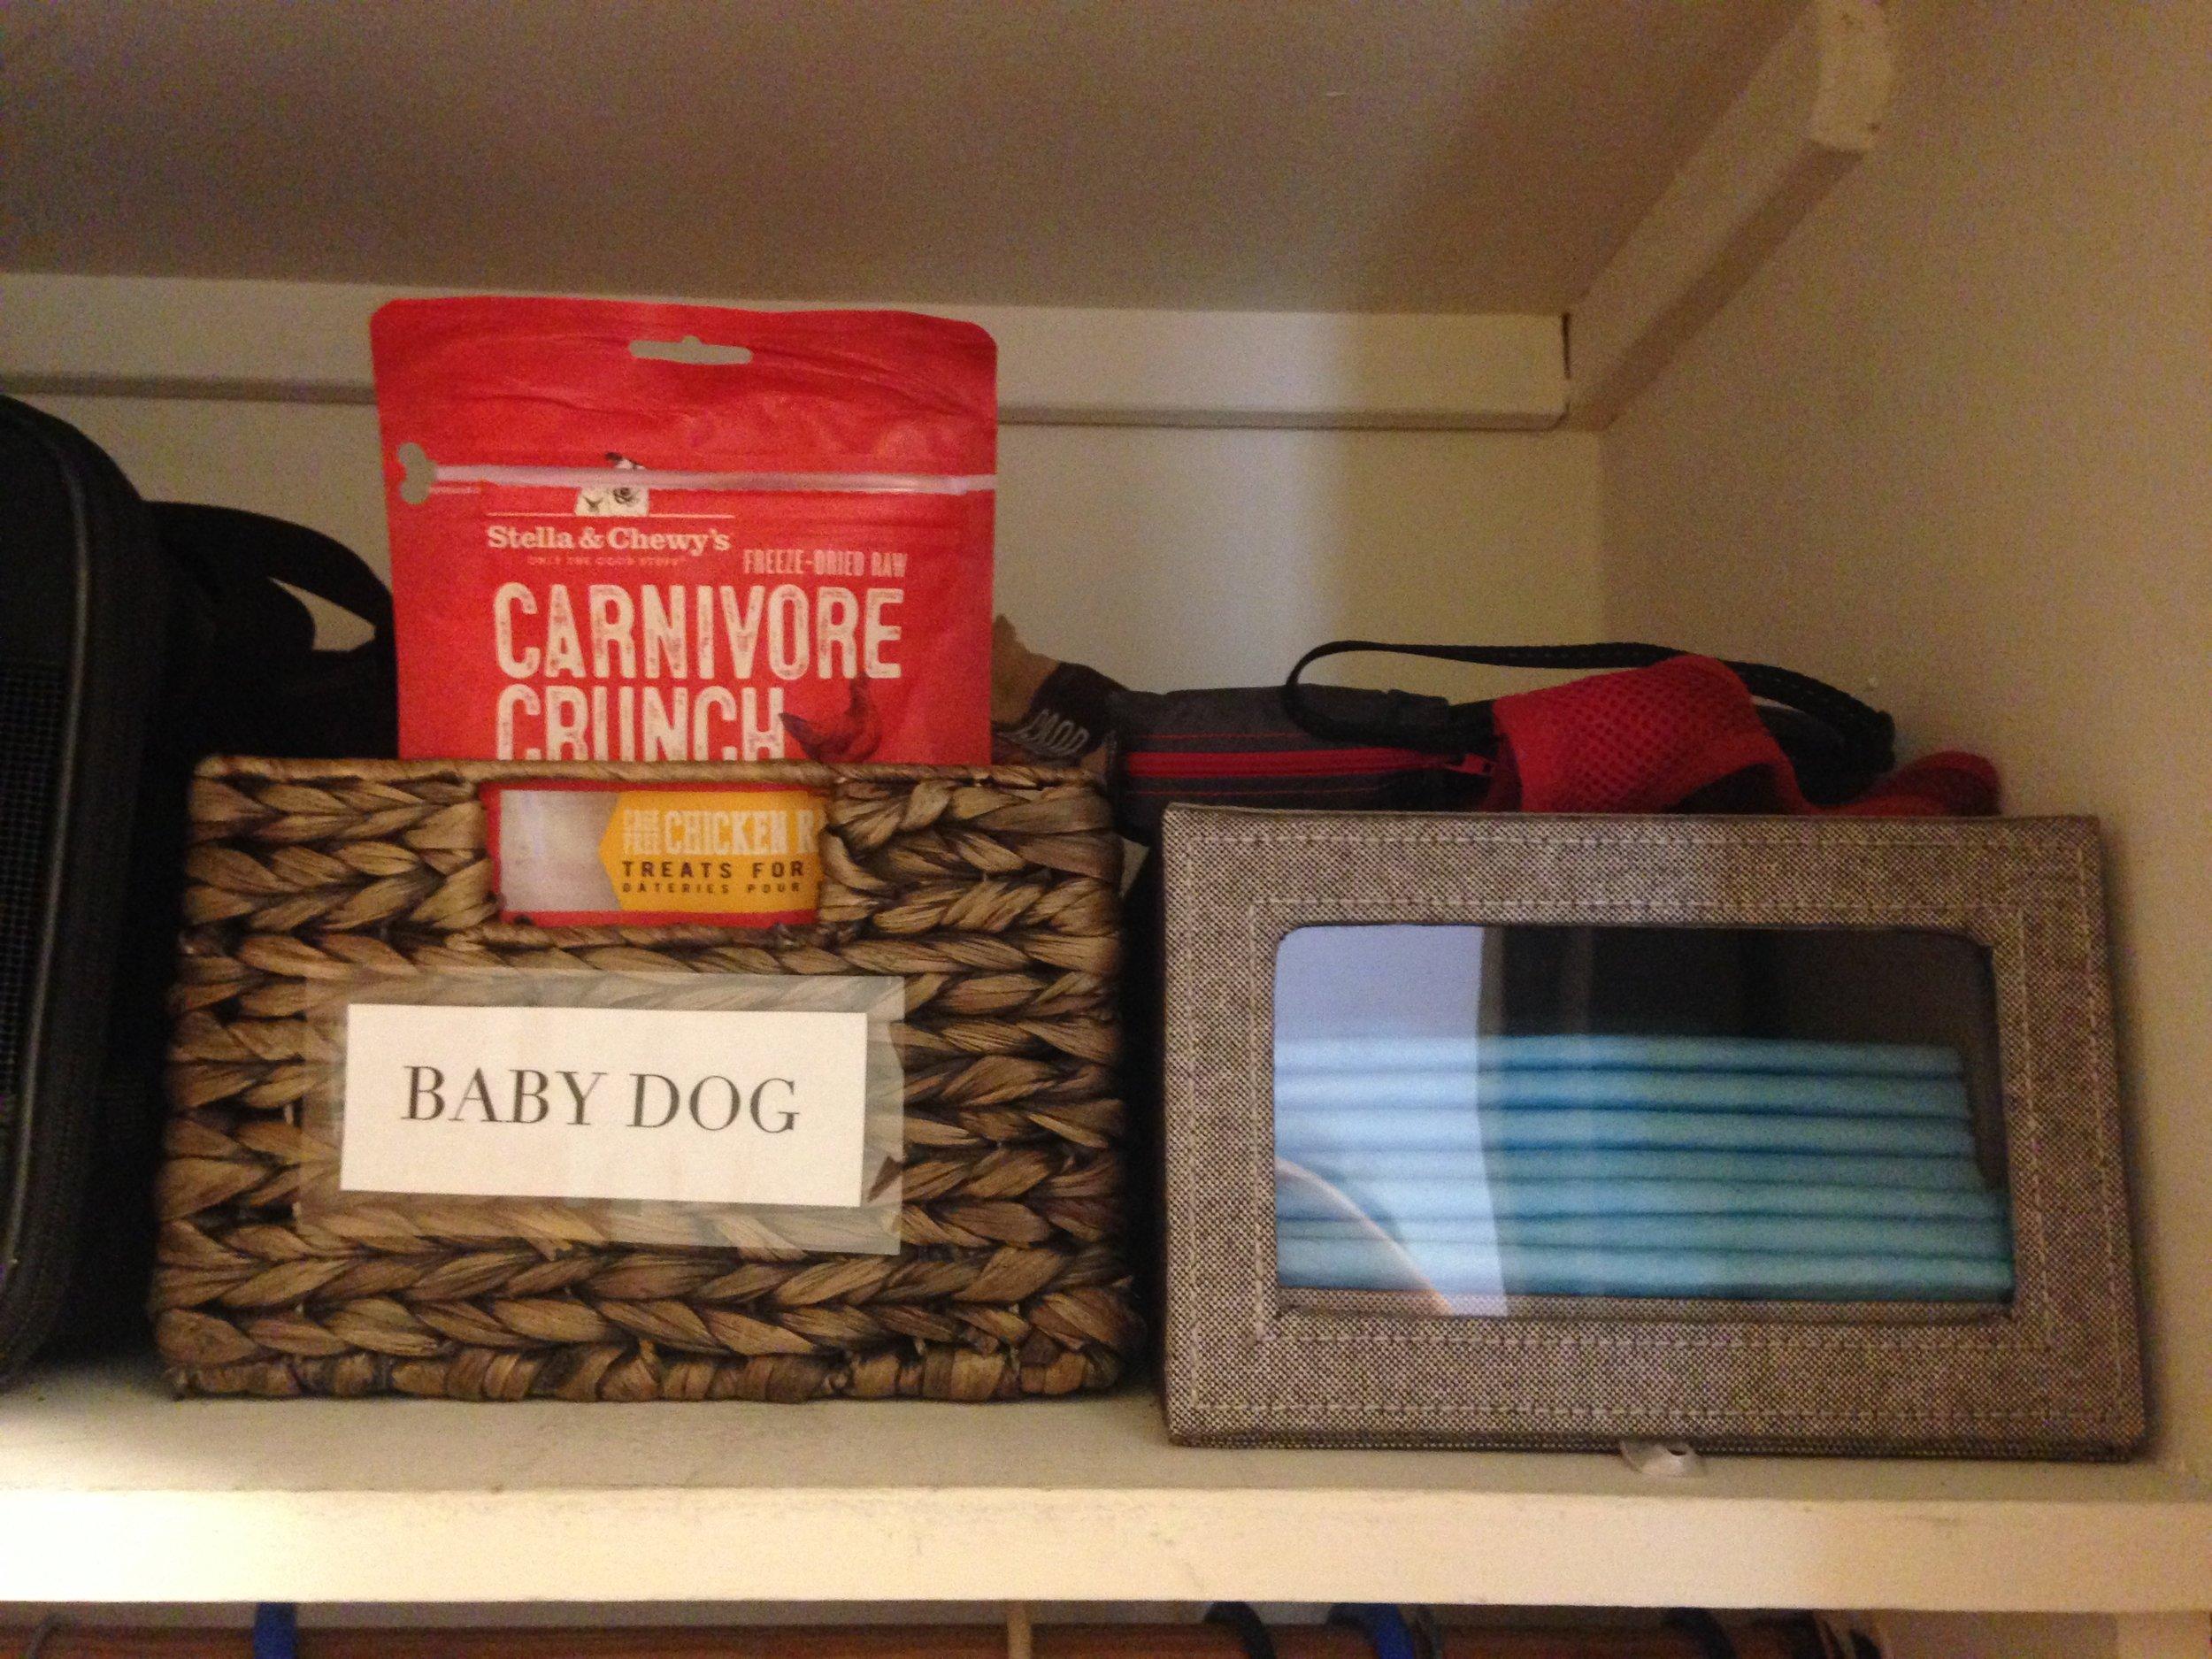 5. Baby Dog's accessories